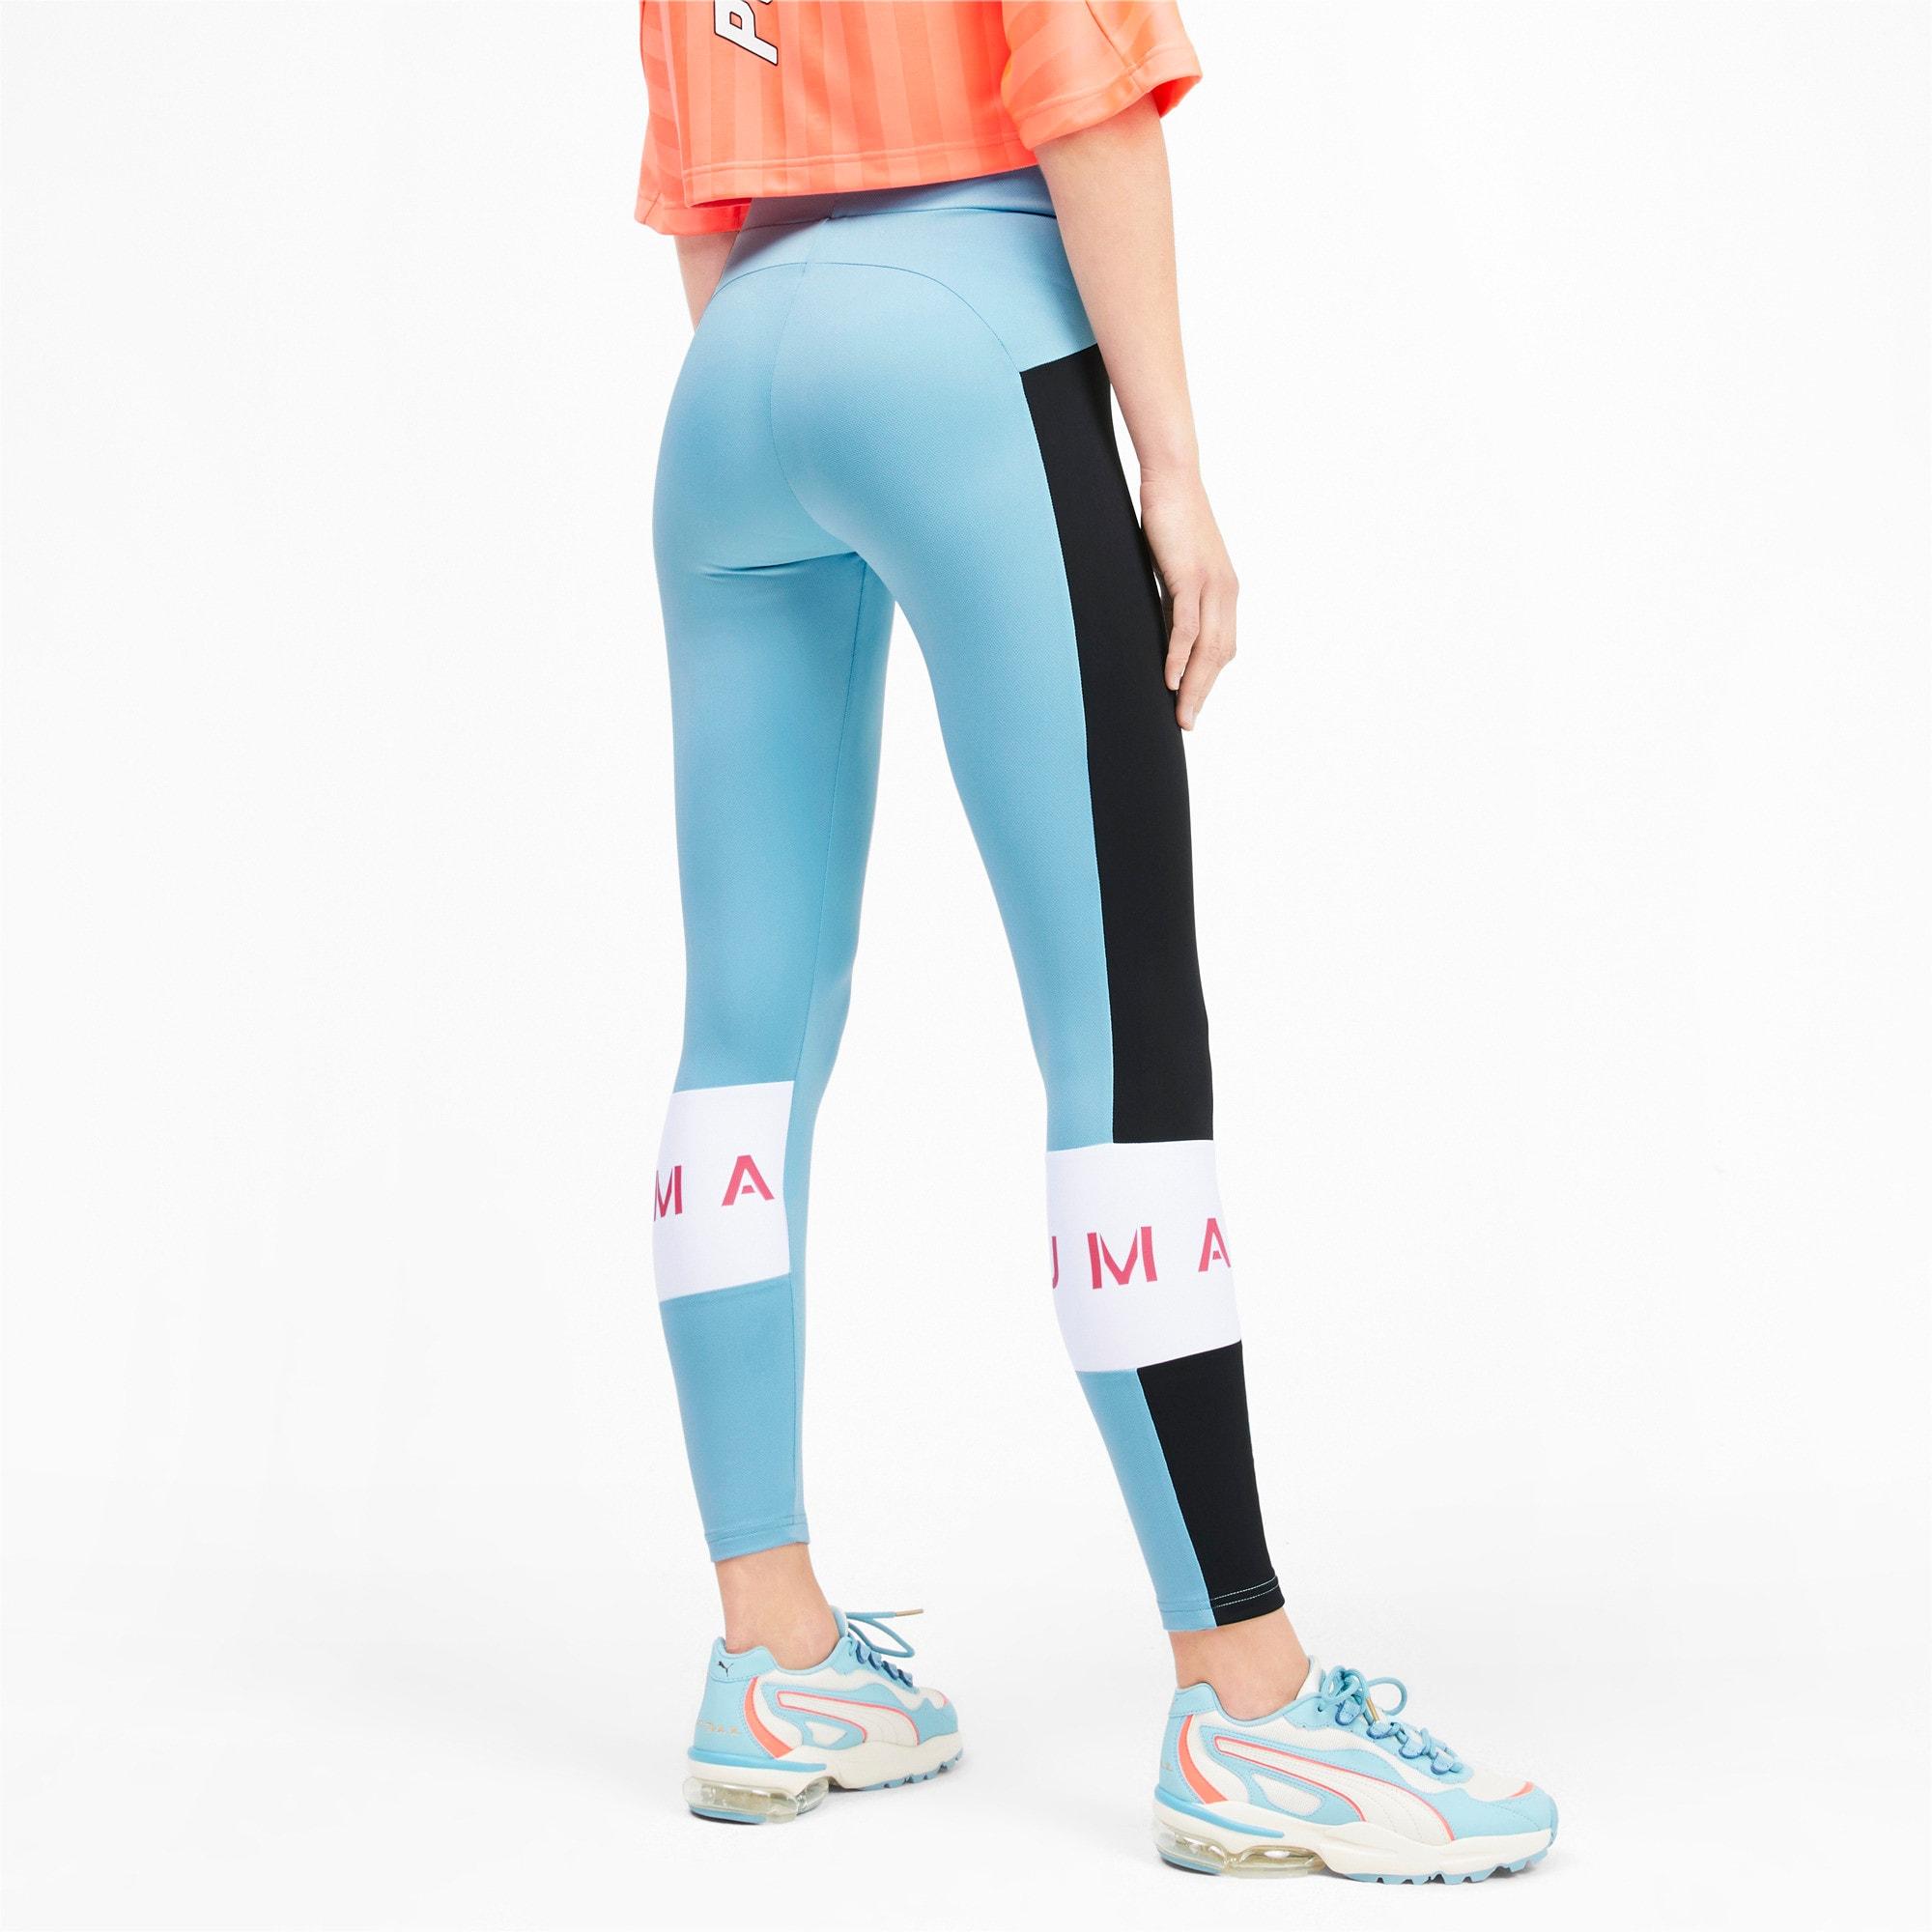 Thumbnail 2 van PUMA XTG legging voor vrouwen, Milky Blue, medium